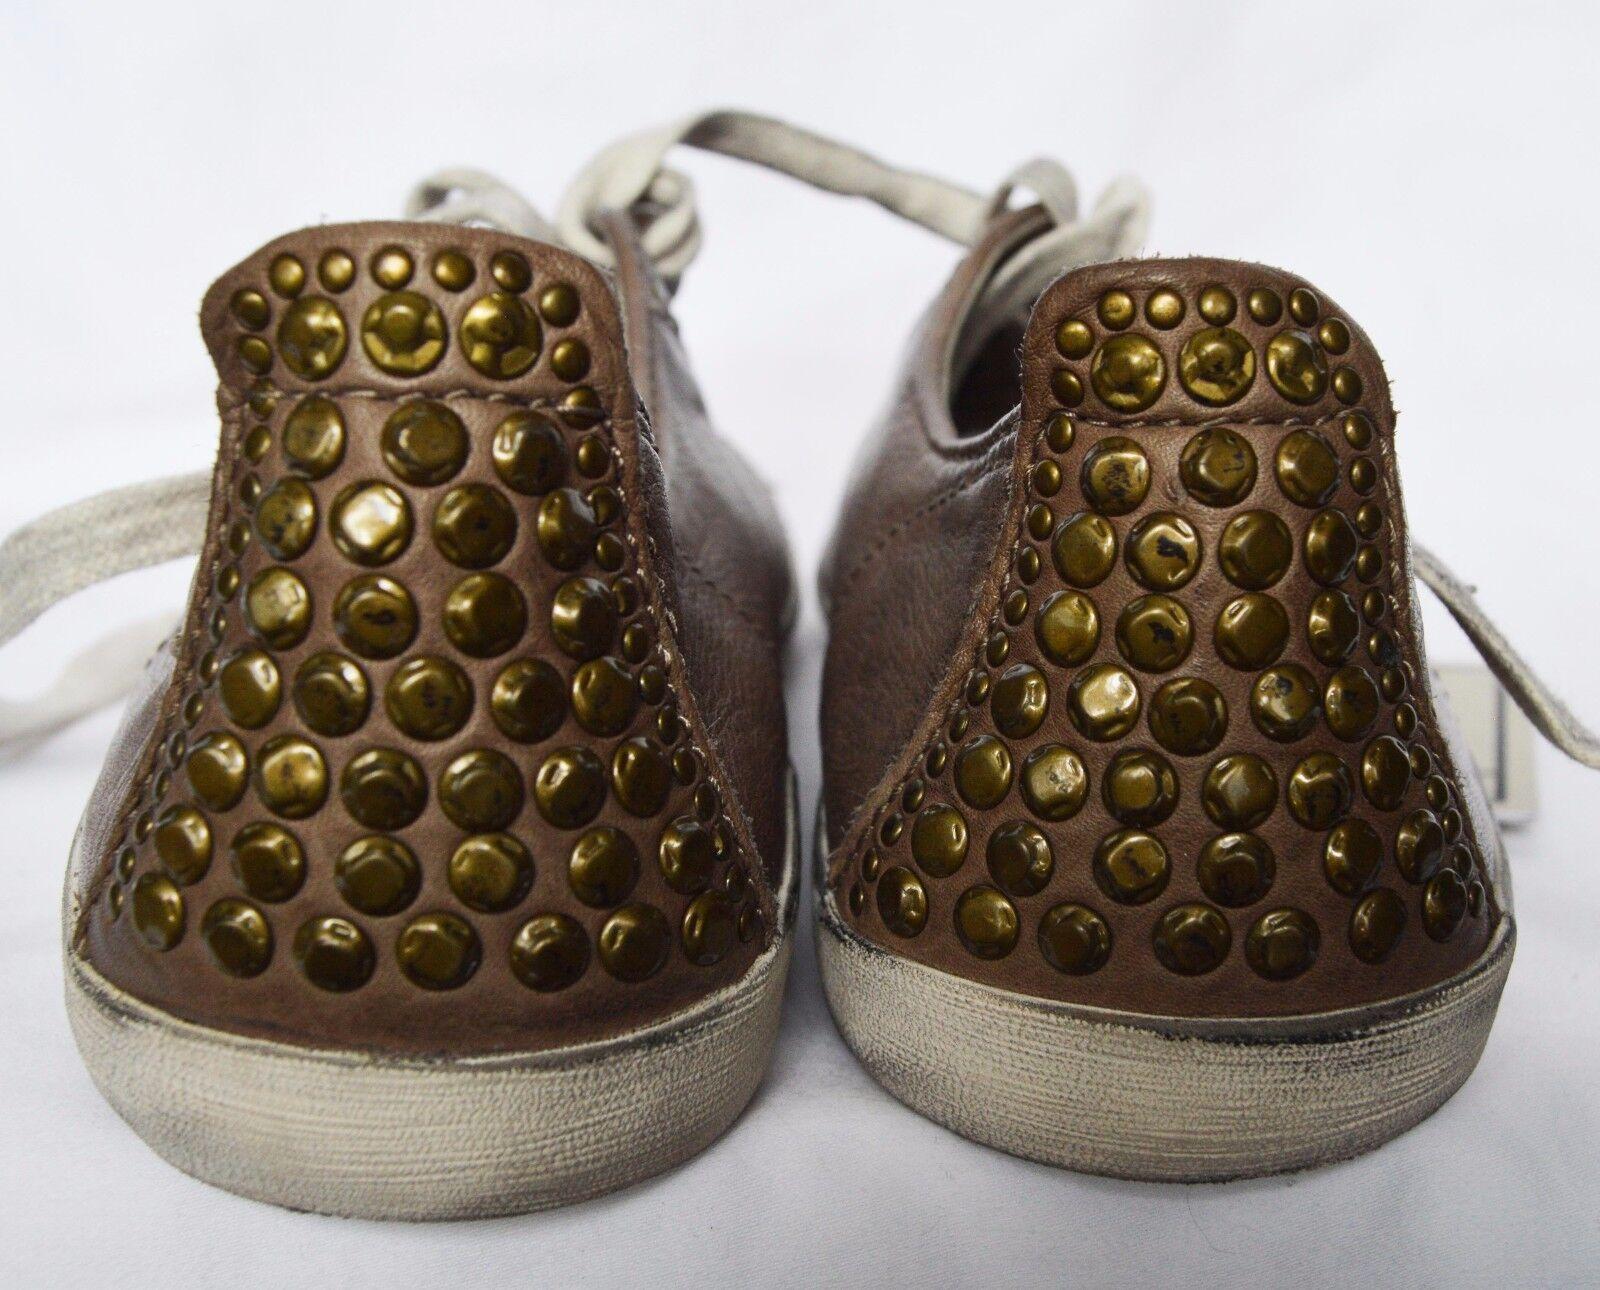 Women's FRYE KIRA Studded Taupe Leather Fashion Fashion Fashion Sneakers Sz. 6   198 1a38ba